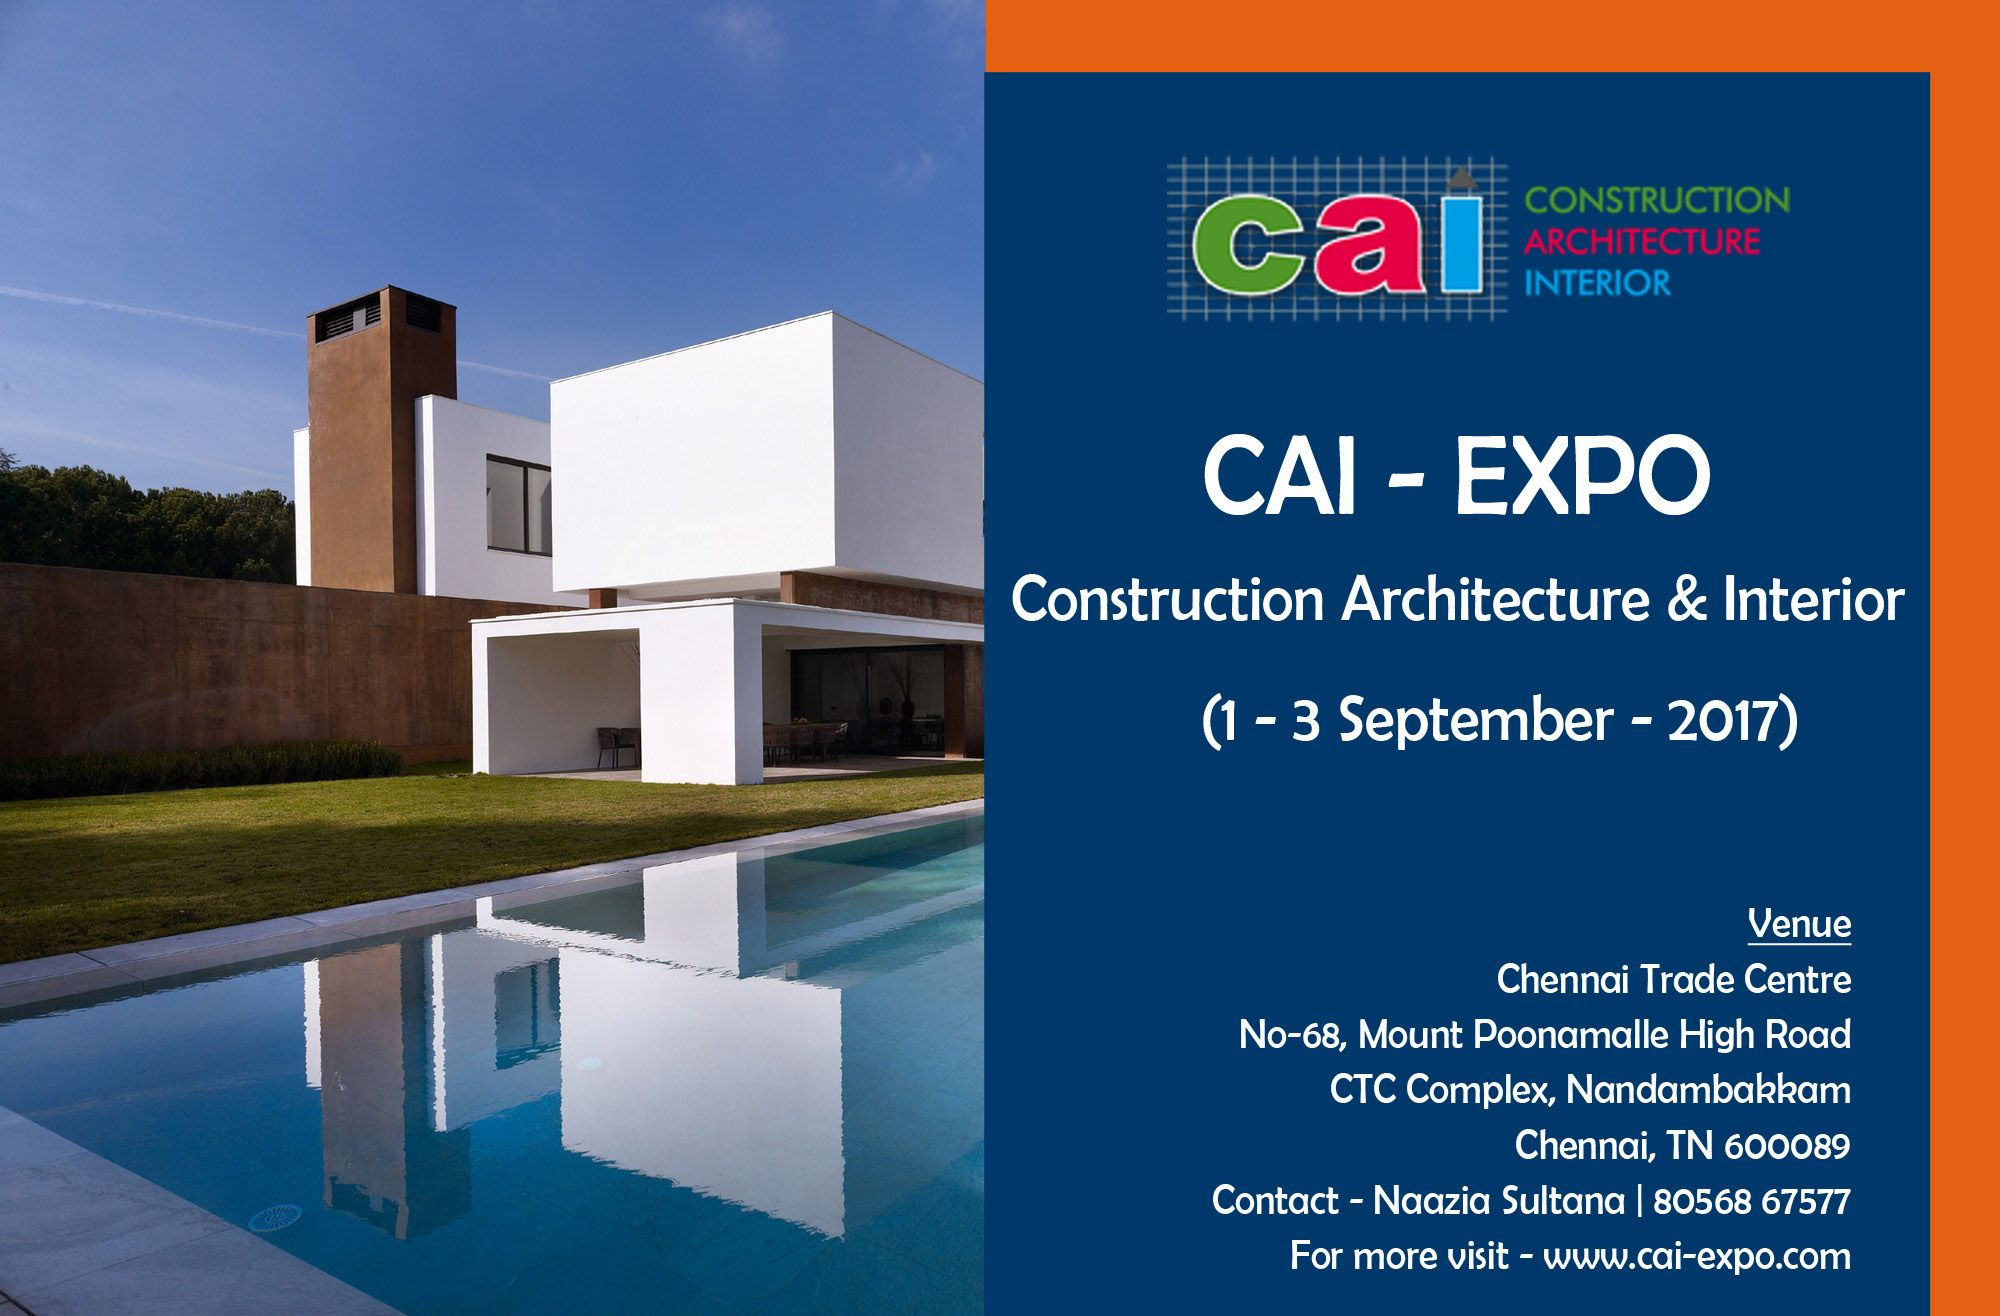 CONSTRUCTION ARCHITECTURE INTERIOR DESIGN EVENTS EXHIBITION 2017 CAI Construction